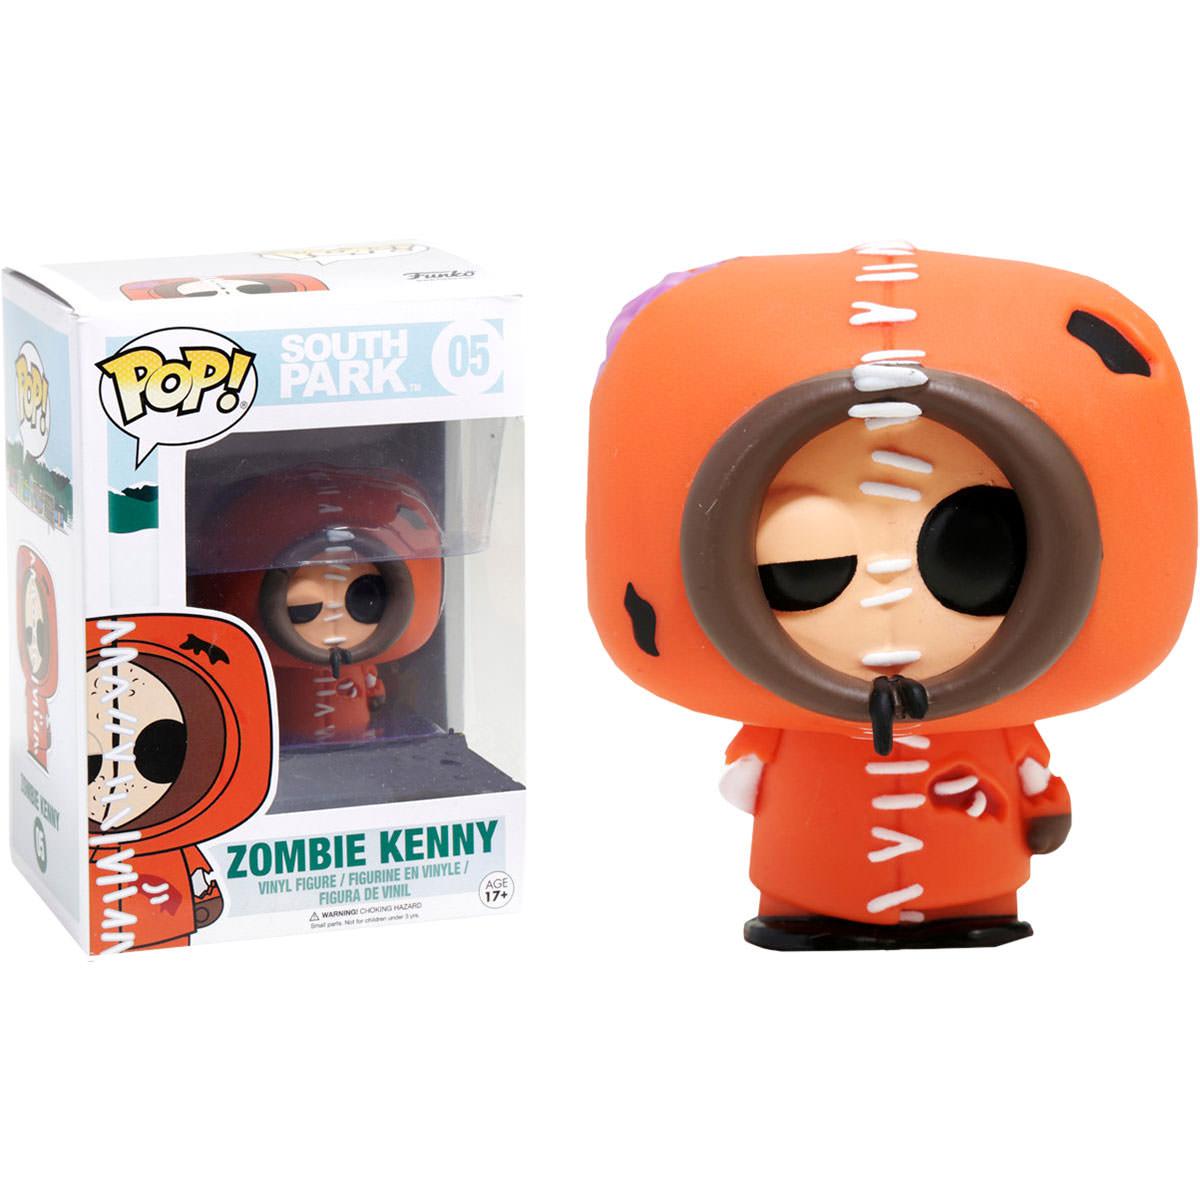 Funko South Park Zombie Kenny Pop Vinyl Figure At Hobby